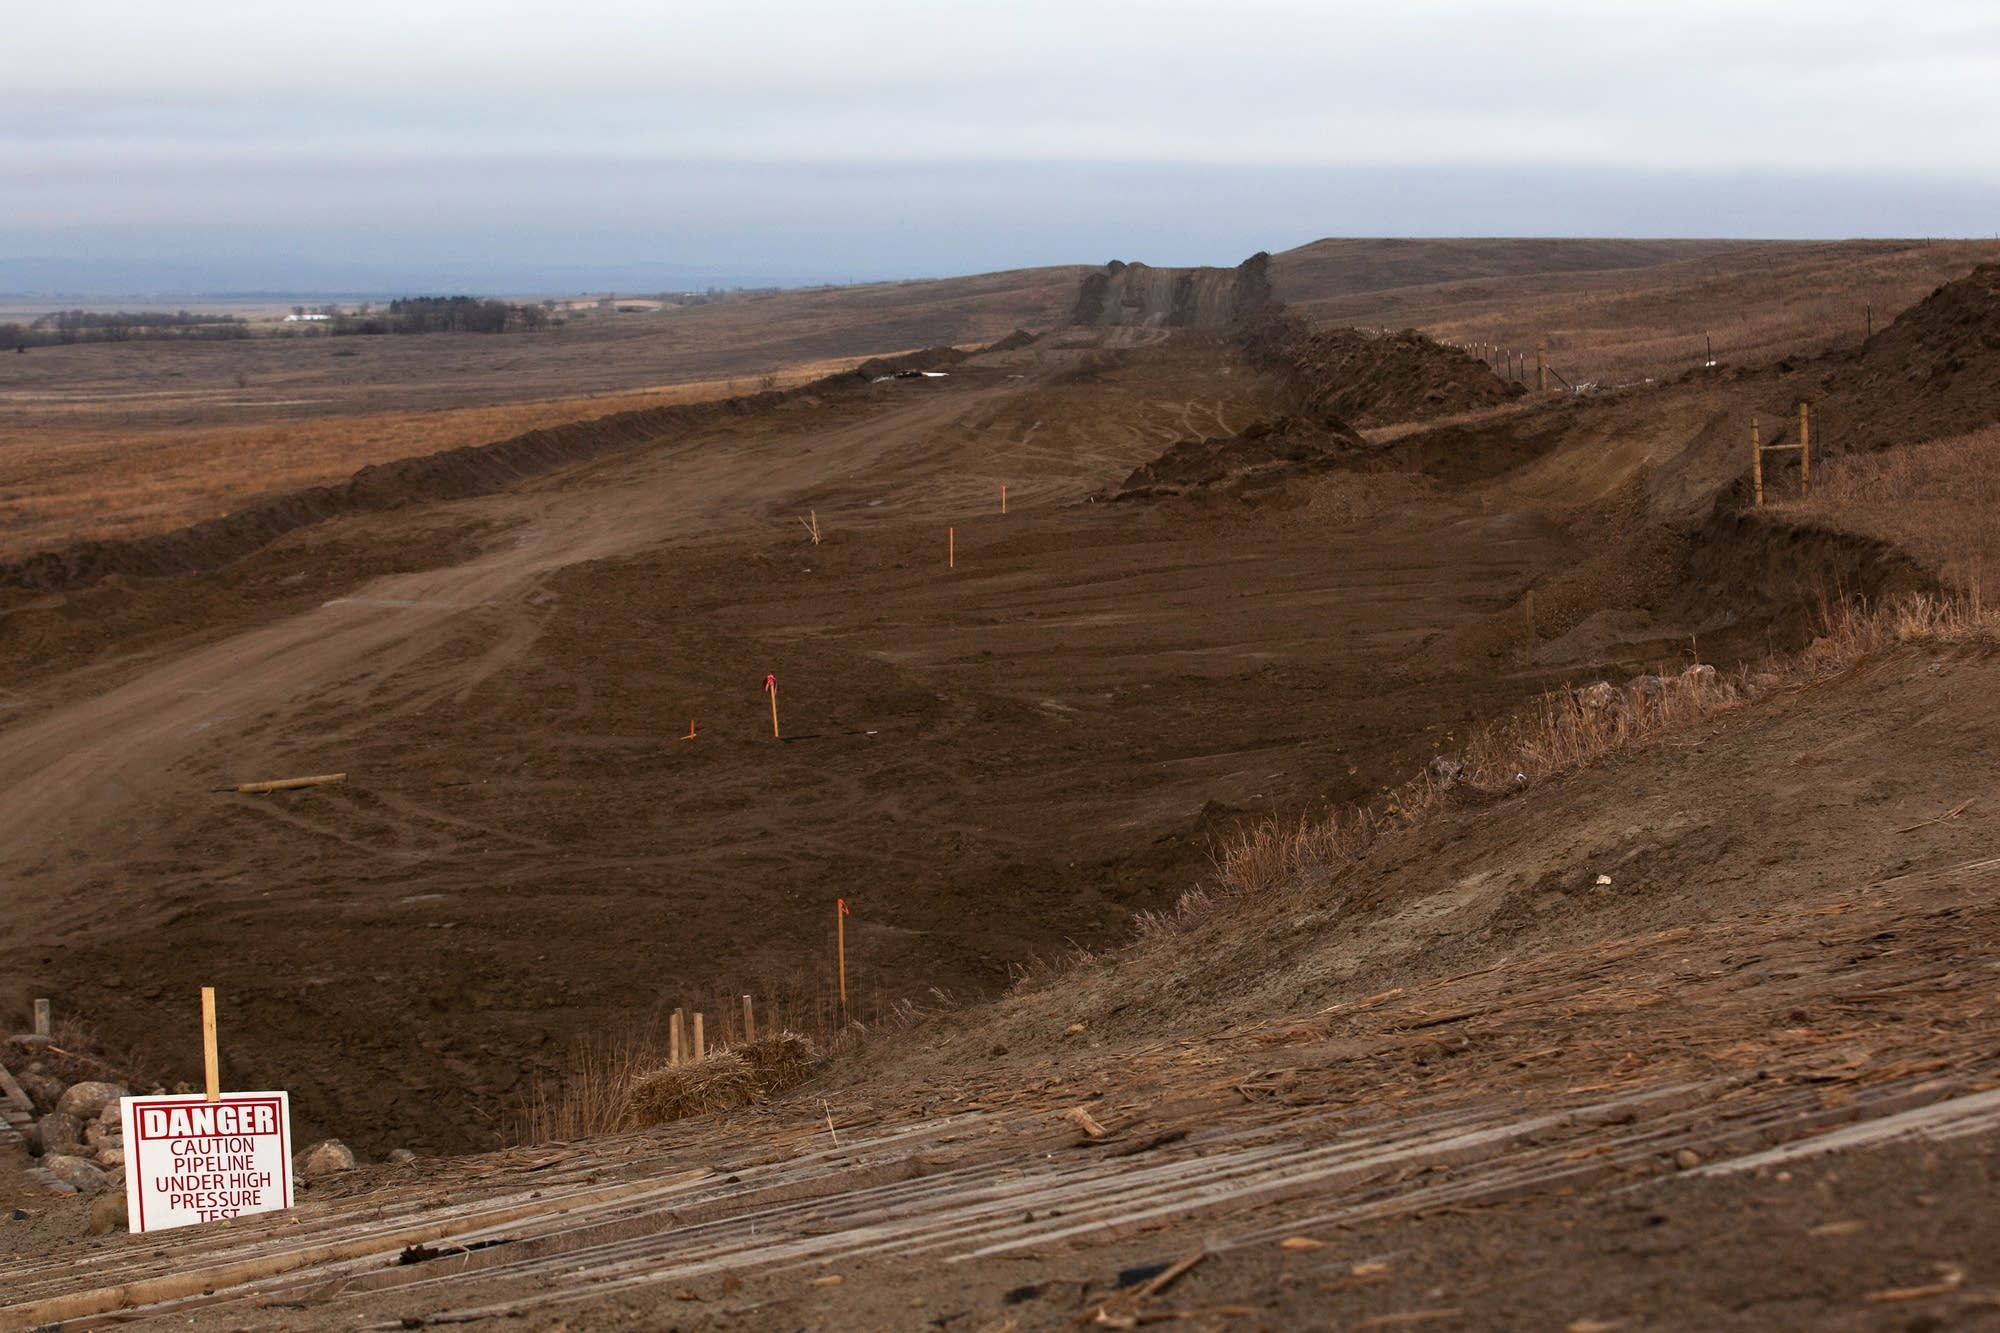 Evidence of Dakota Access oil pipeline construction